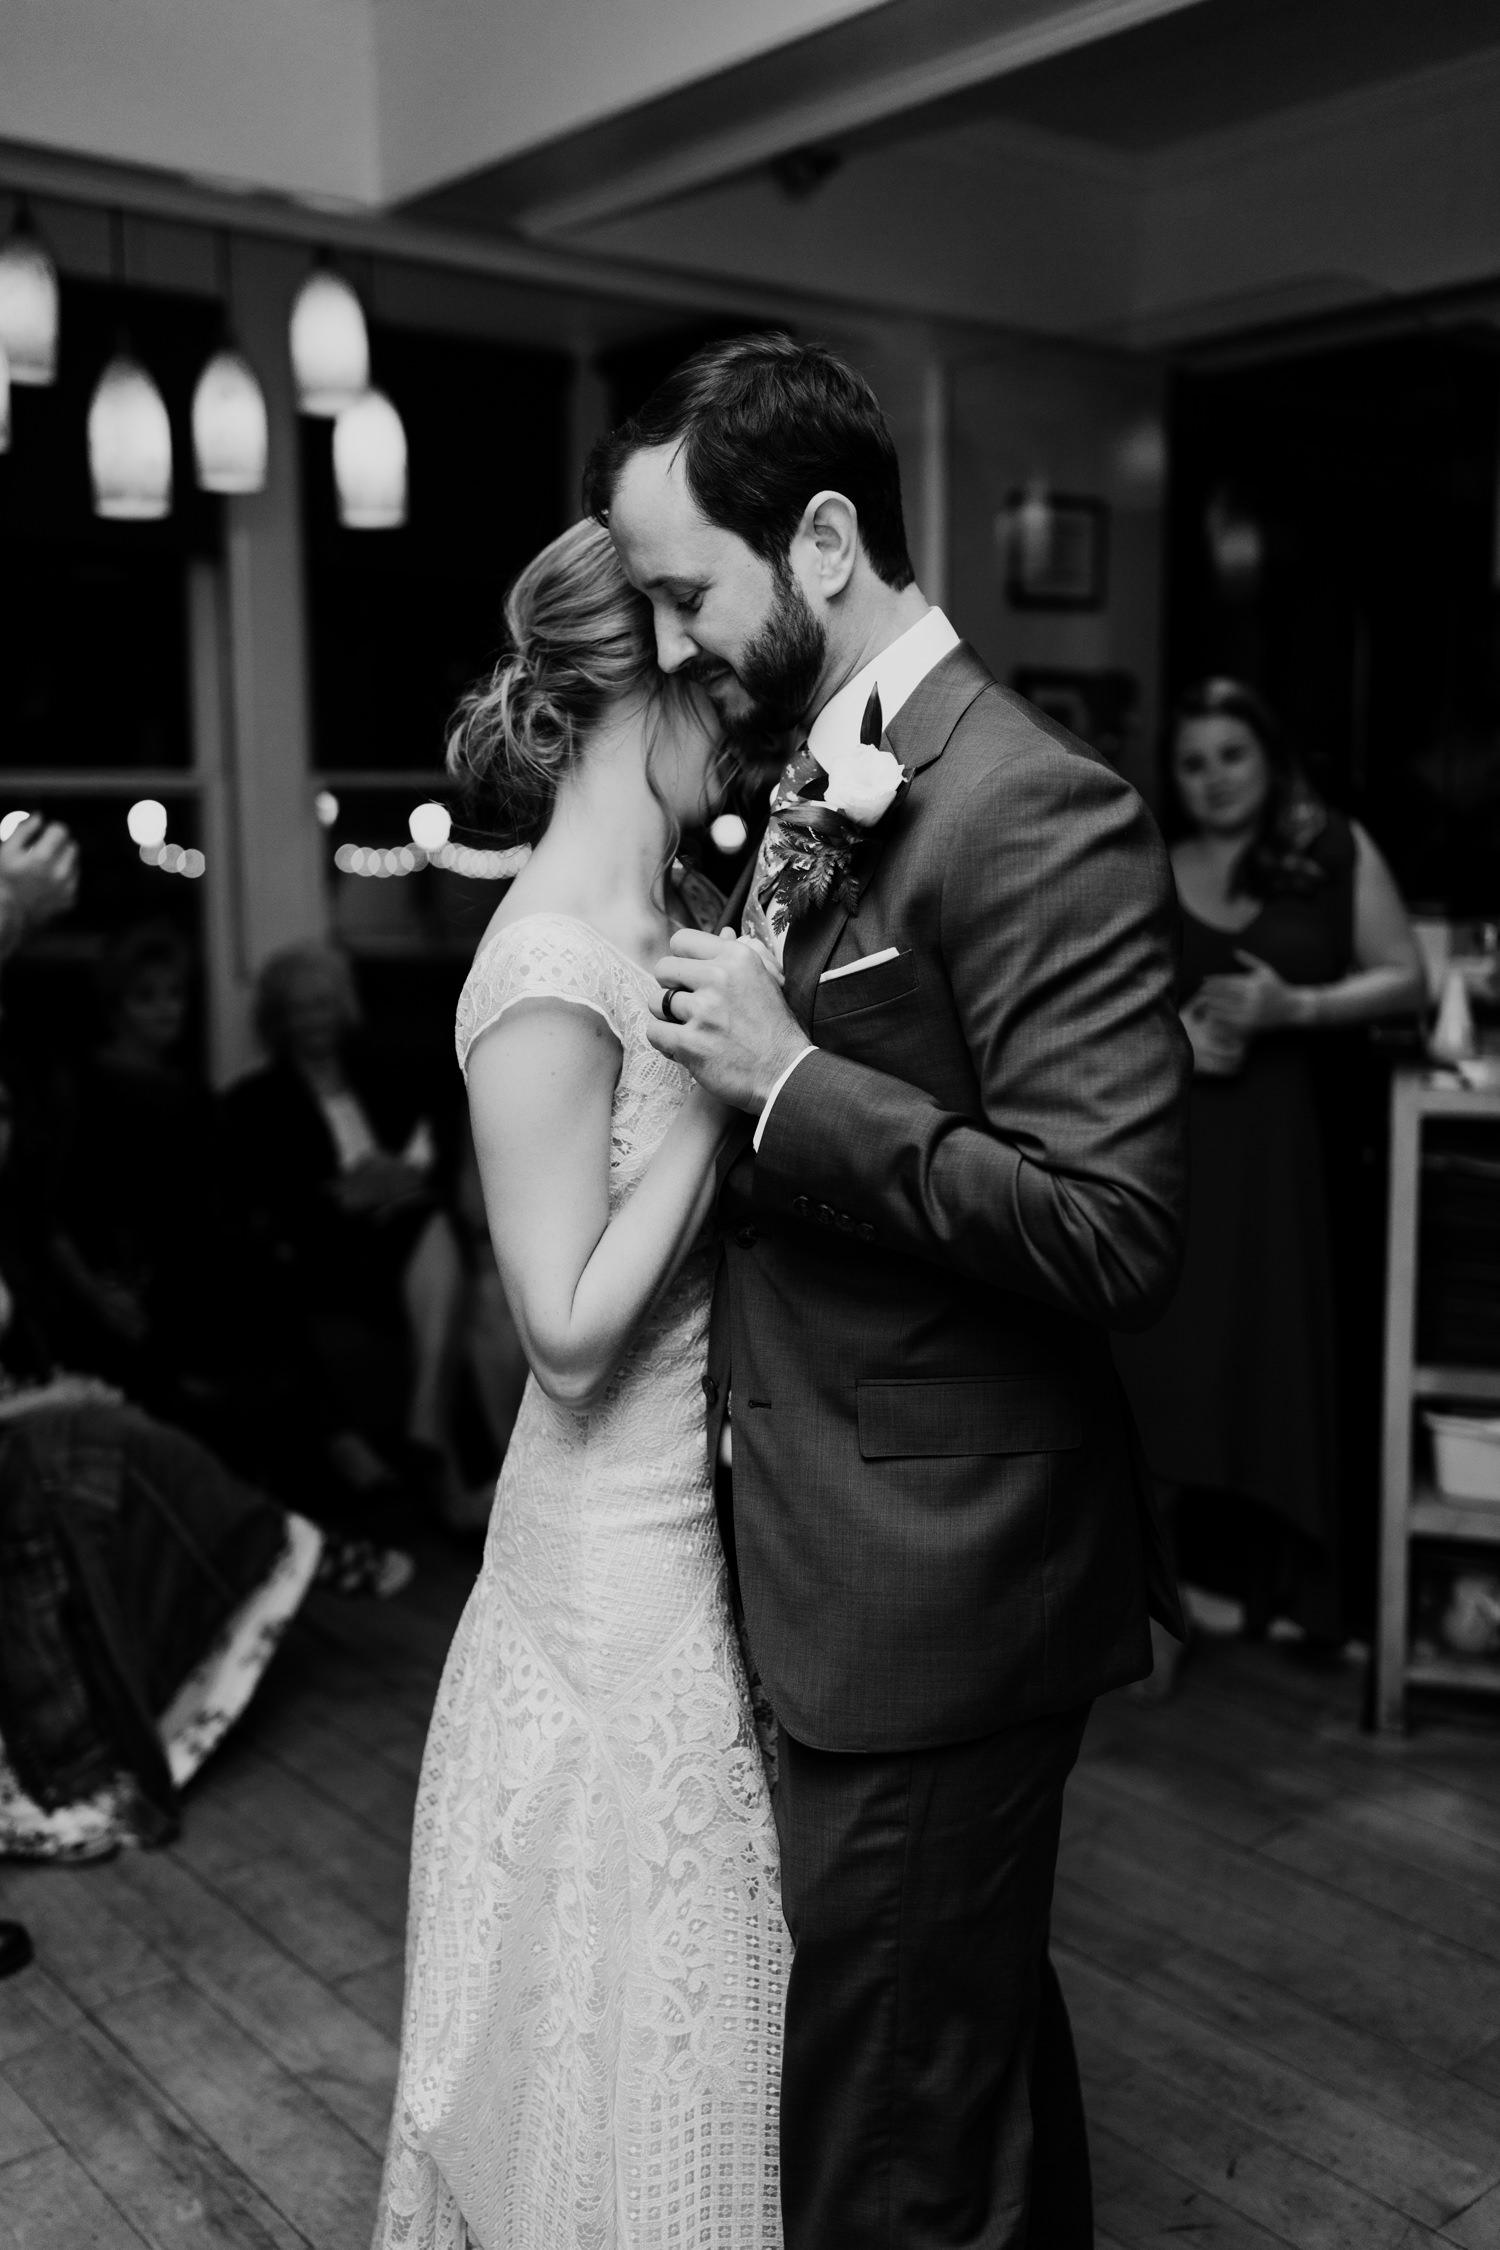 bohemian-backyard-wedding-breckenridge-colorado-148.jpg